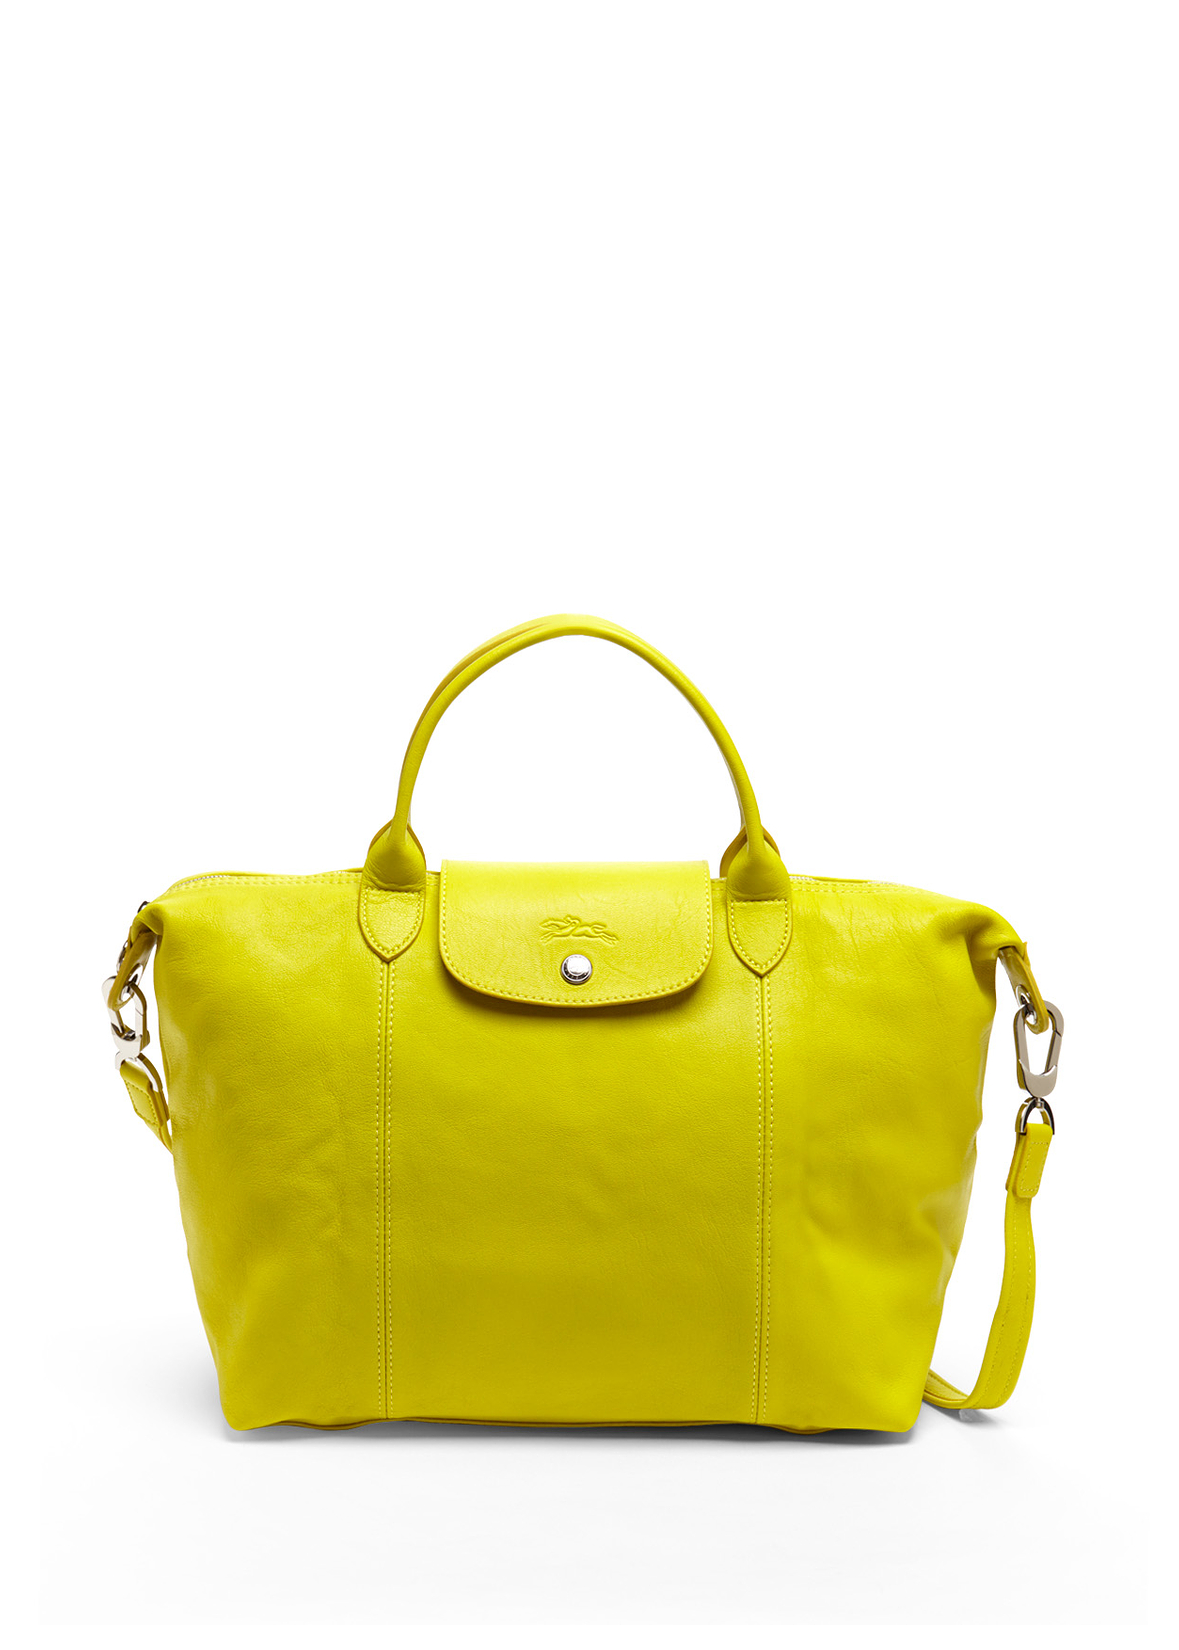 Longchamp Yellow Le Pliage Cuir Handbag - 17% off, found on sale ...